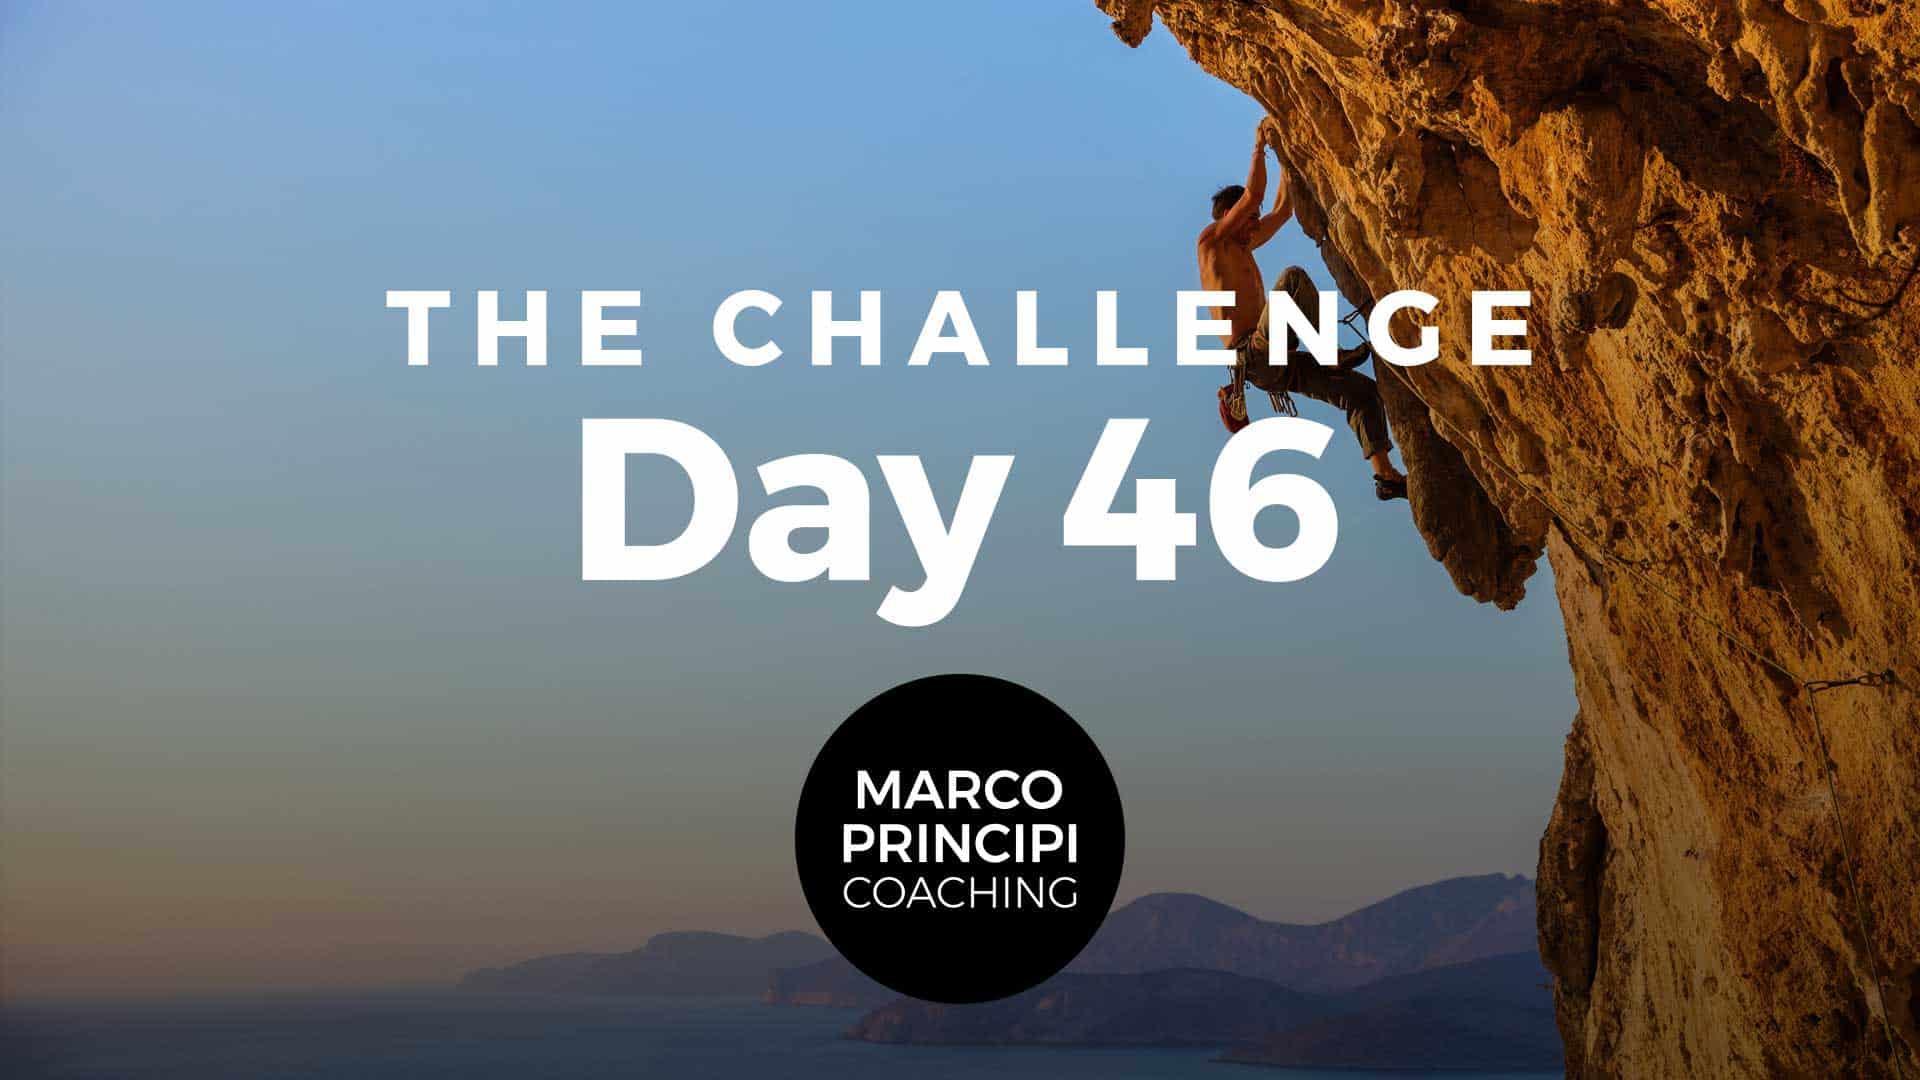 Marco Principi The Challenge Day 46